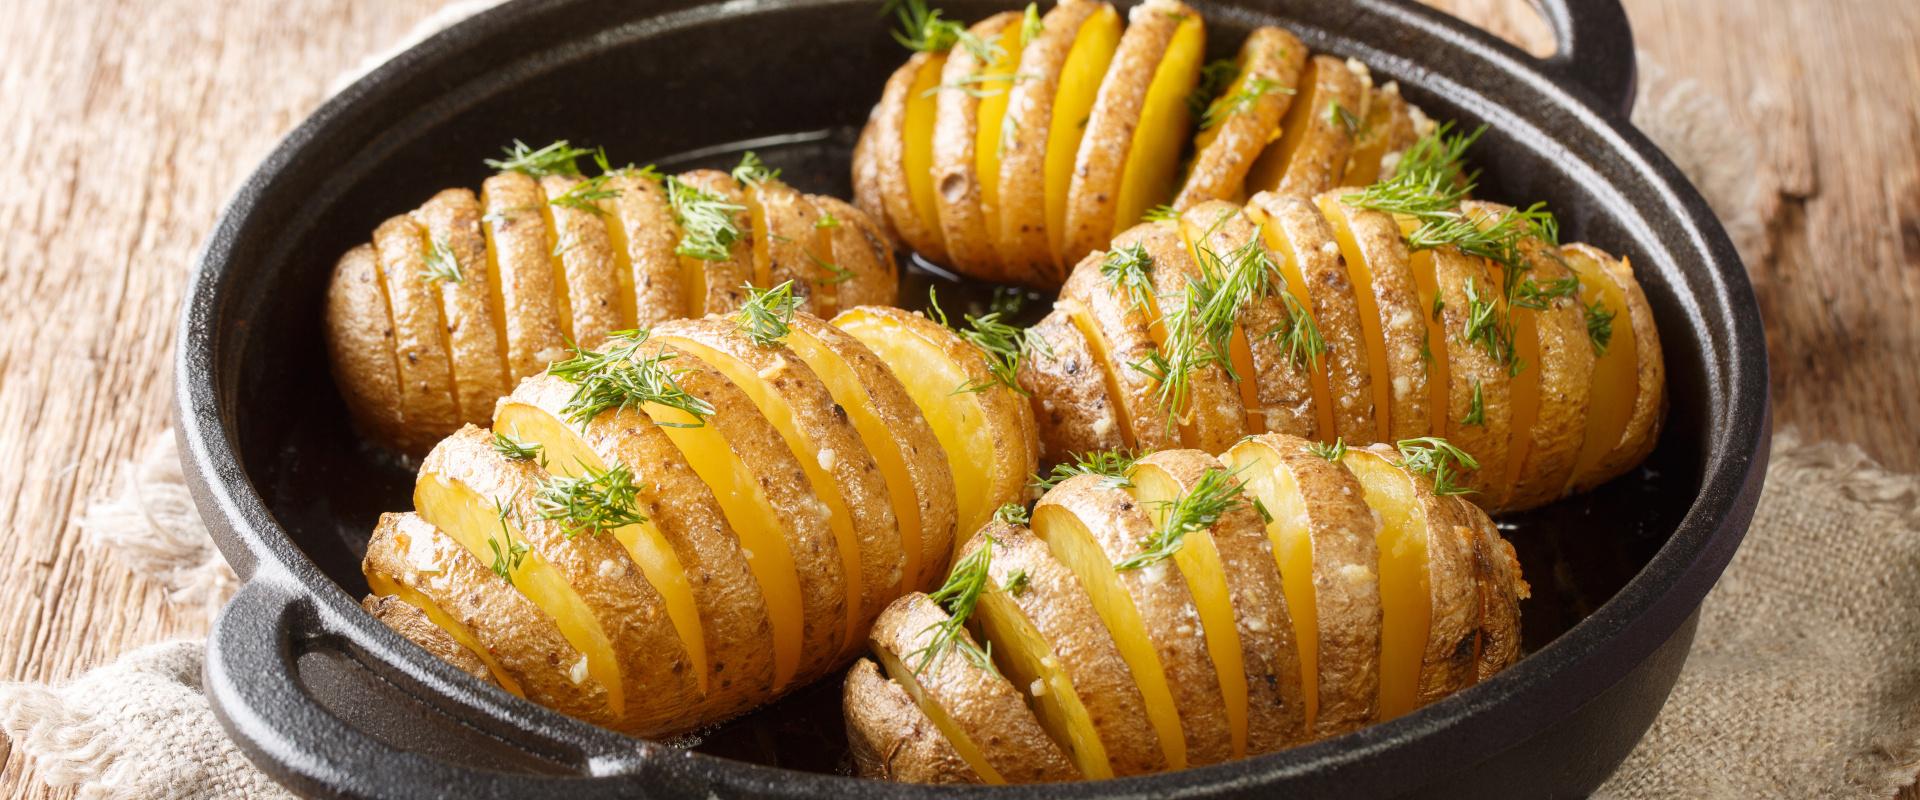 hasselbach krumpli cover